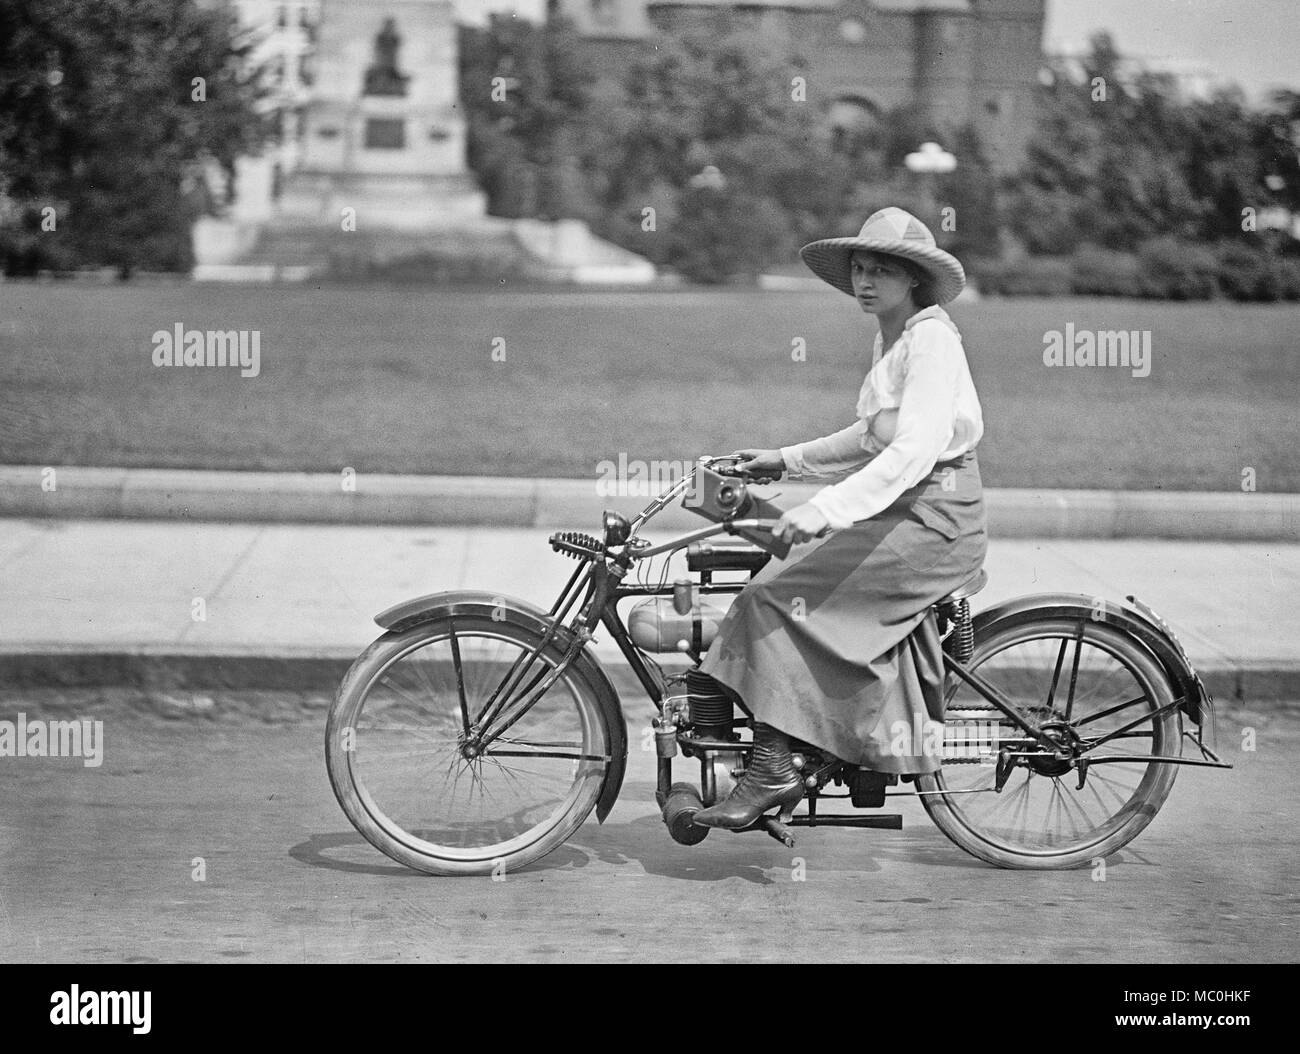 Motorized Black and White Stock Photos & Images - Alamy